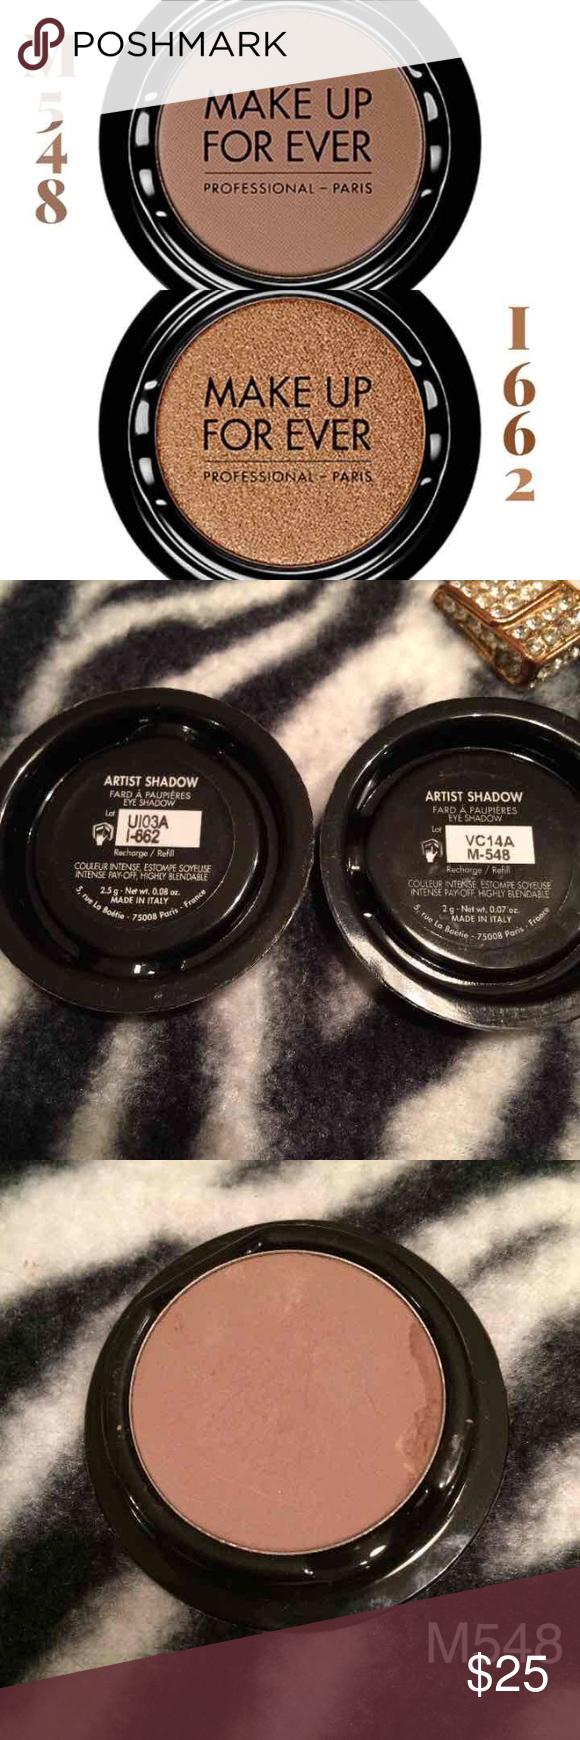 Make up for ever powder blush & eyeshadow refills